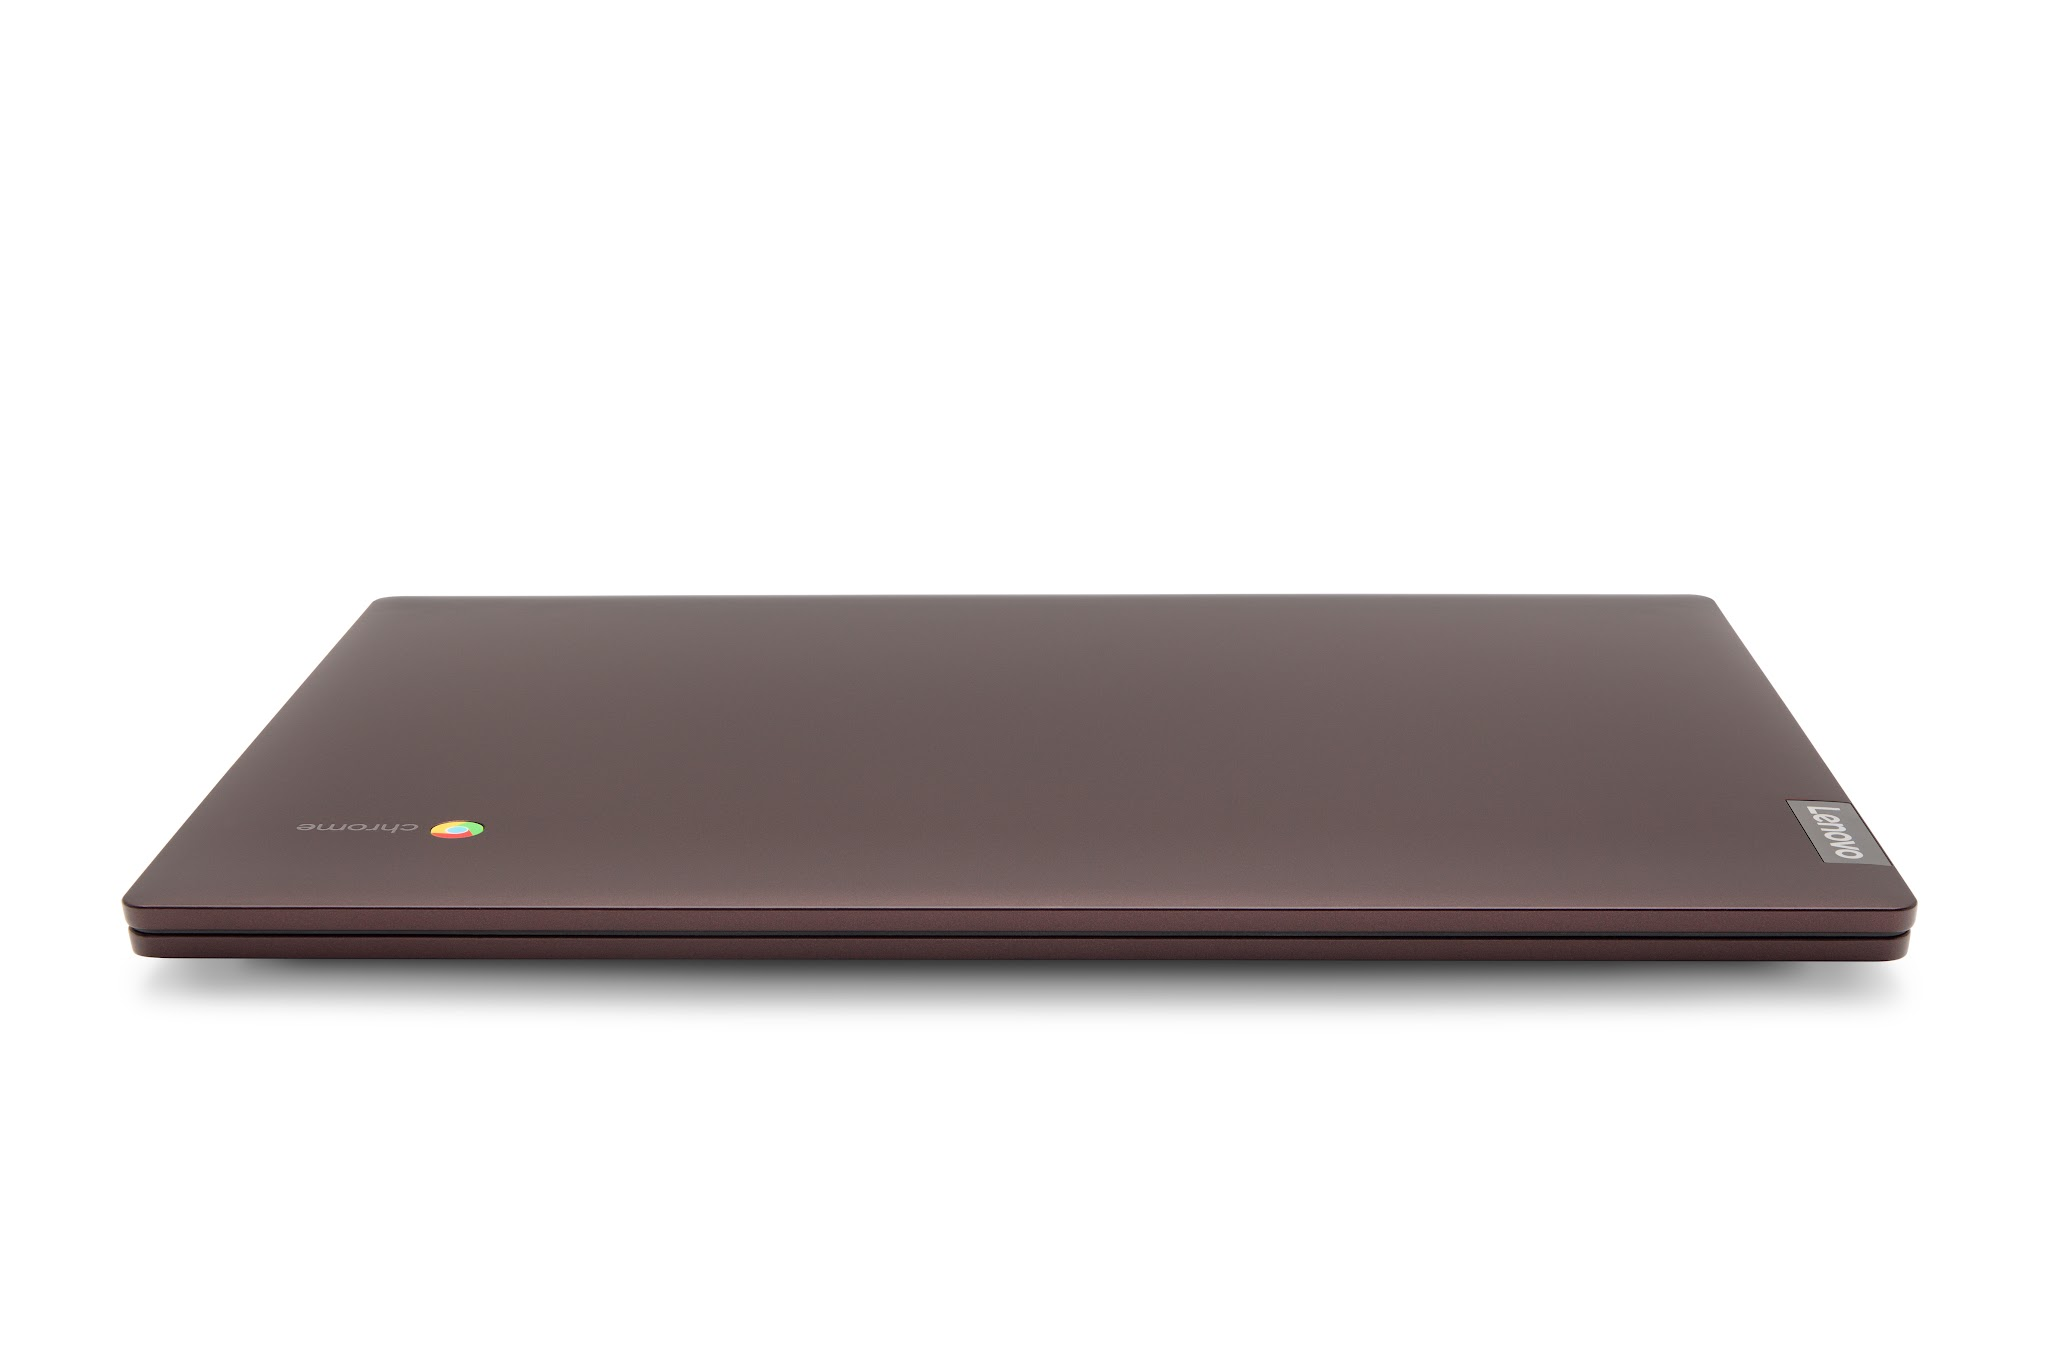 Lenovo Chromebook S340-14 - photo 11